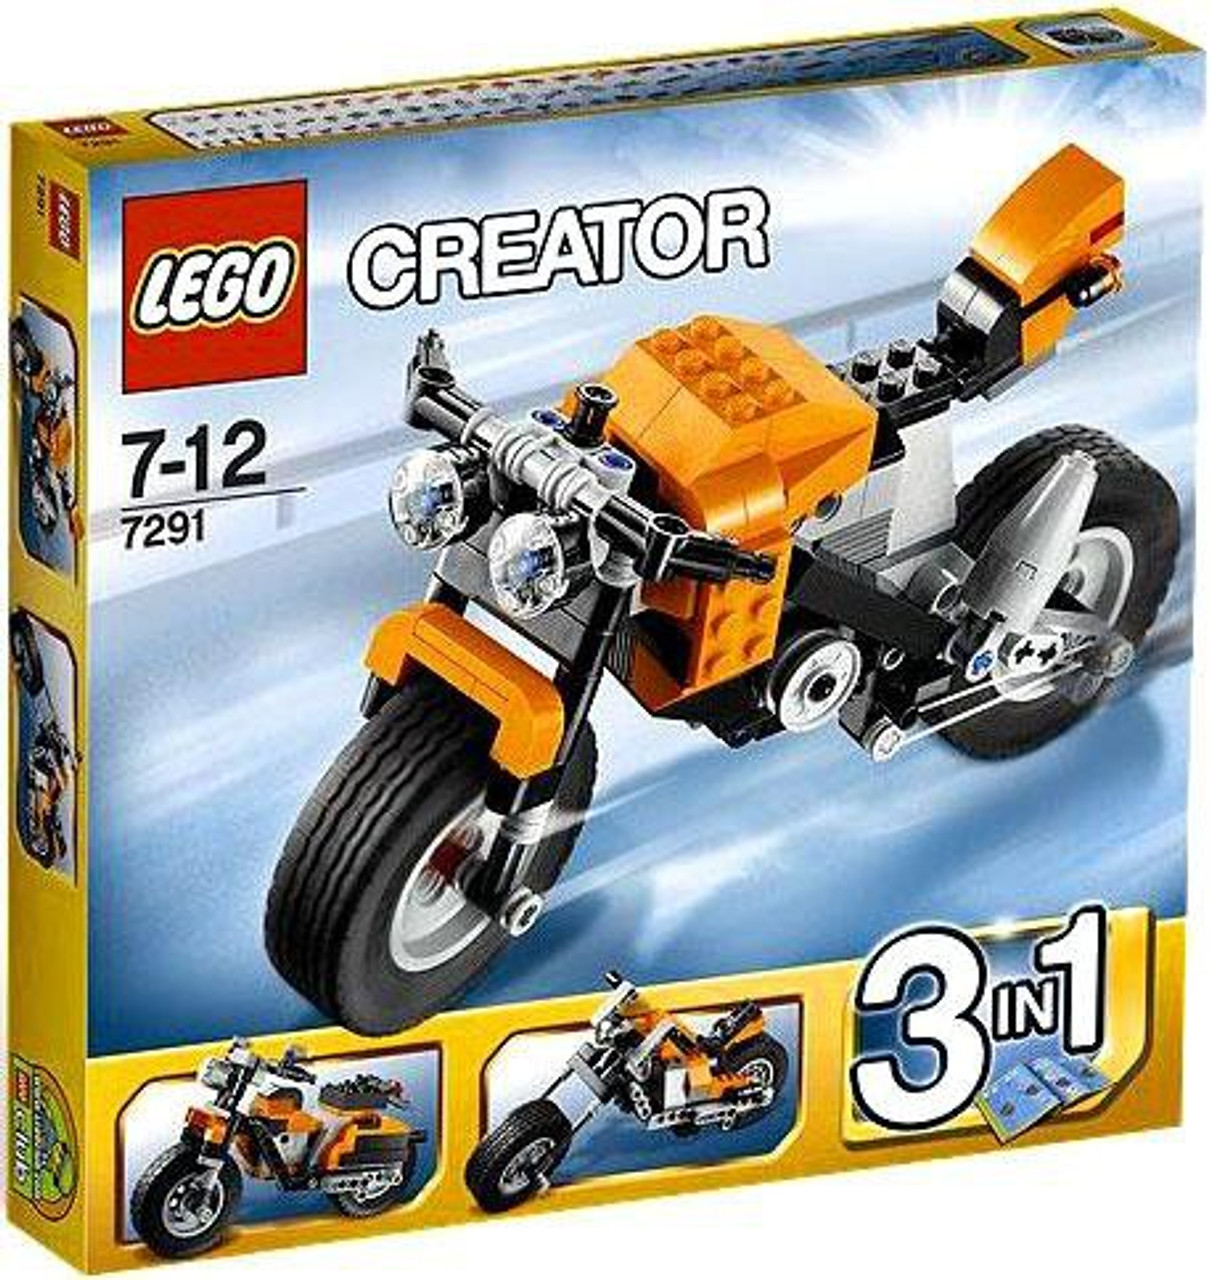 LEGO Creator Street Rebel Set #7291